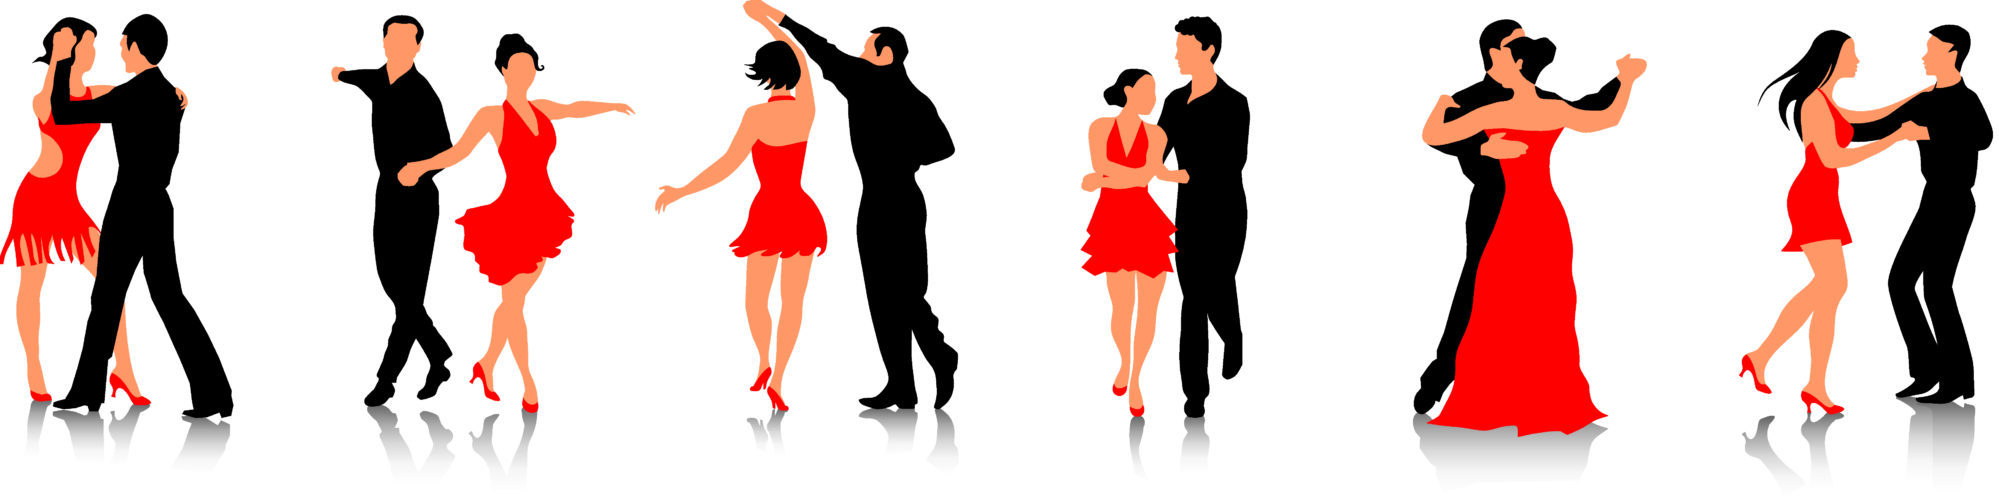 Sacramento Cued Ballroom Dance Club